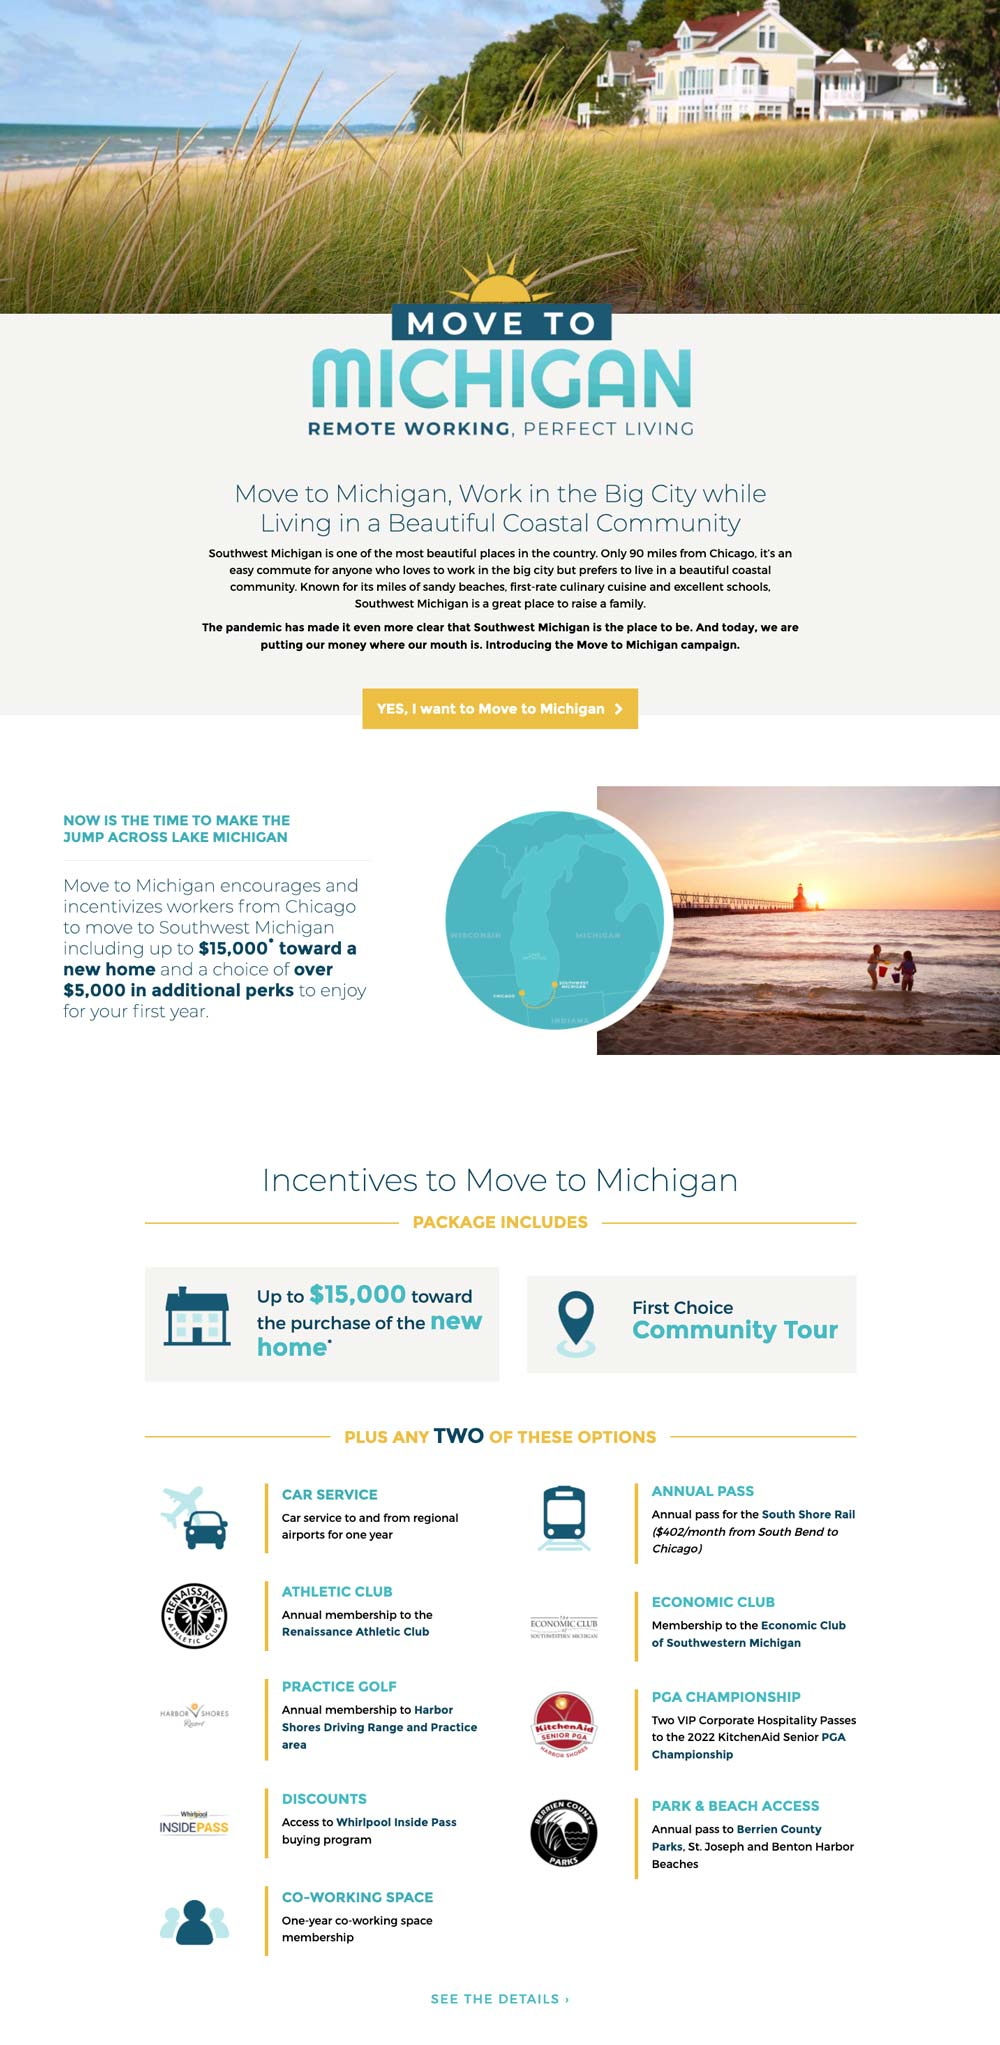 Cornerstone Alliance - Move to Michigan Landing Page